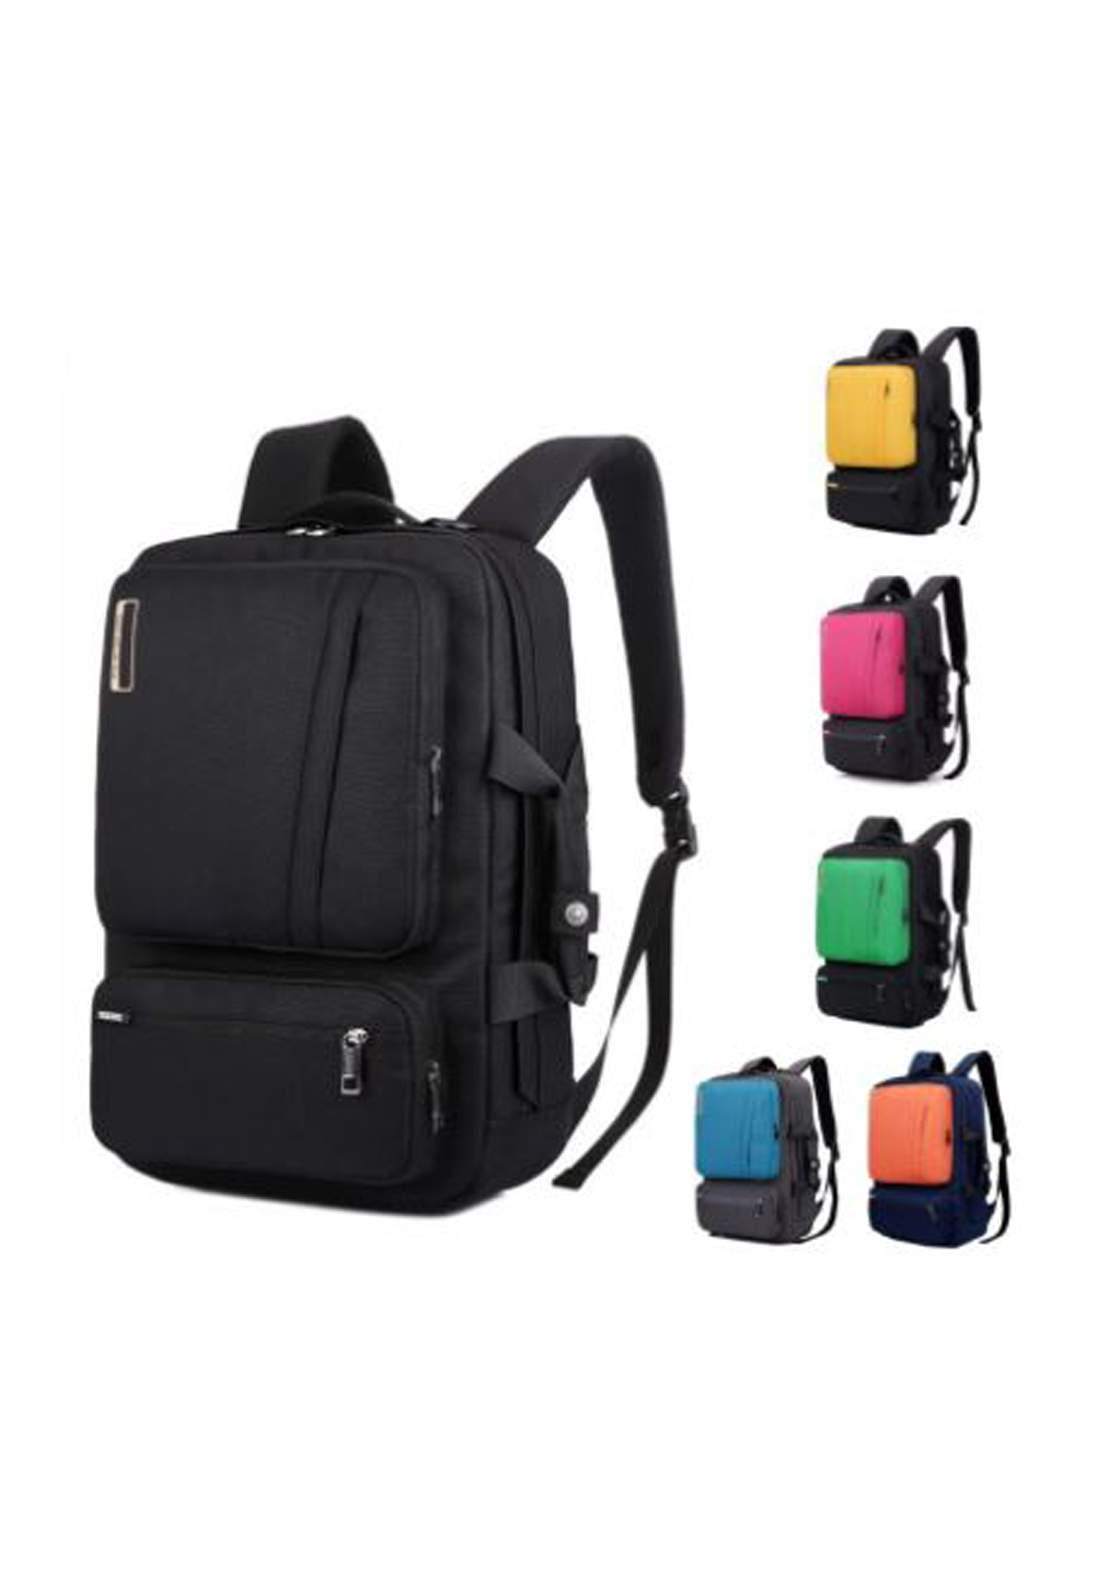 Socko SH-668 Laptop  Backpack حقيبة لابتوب